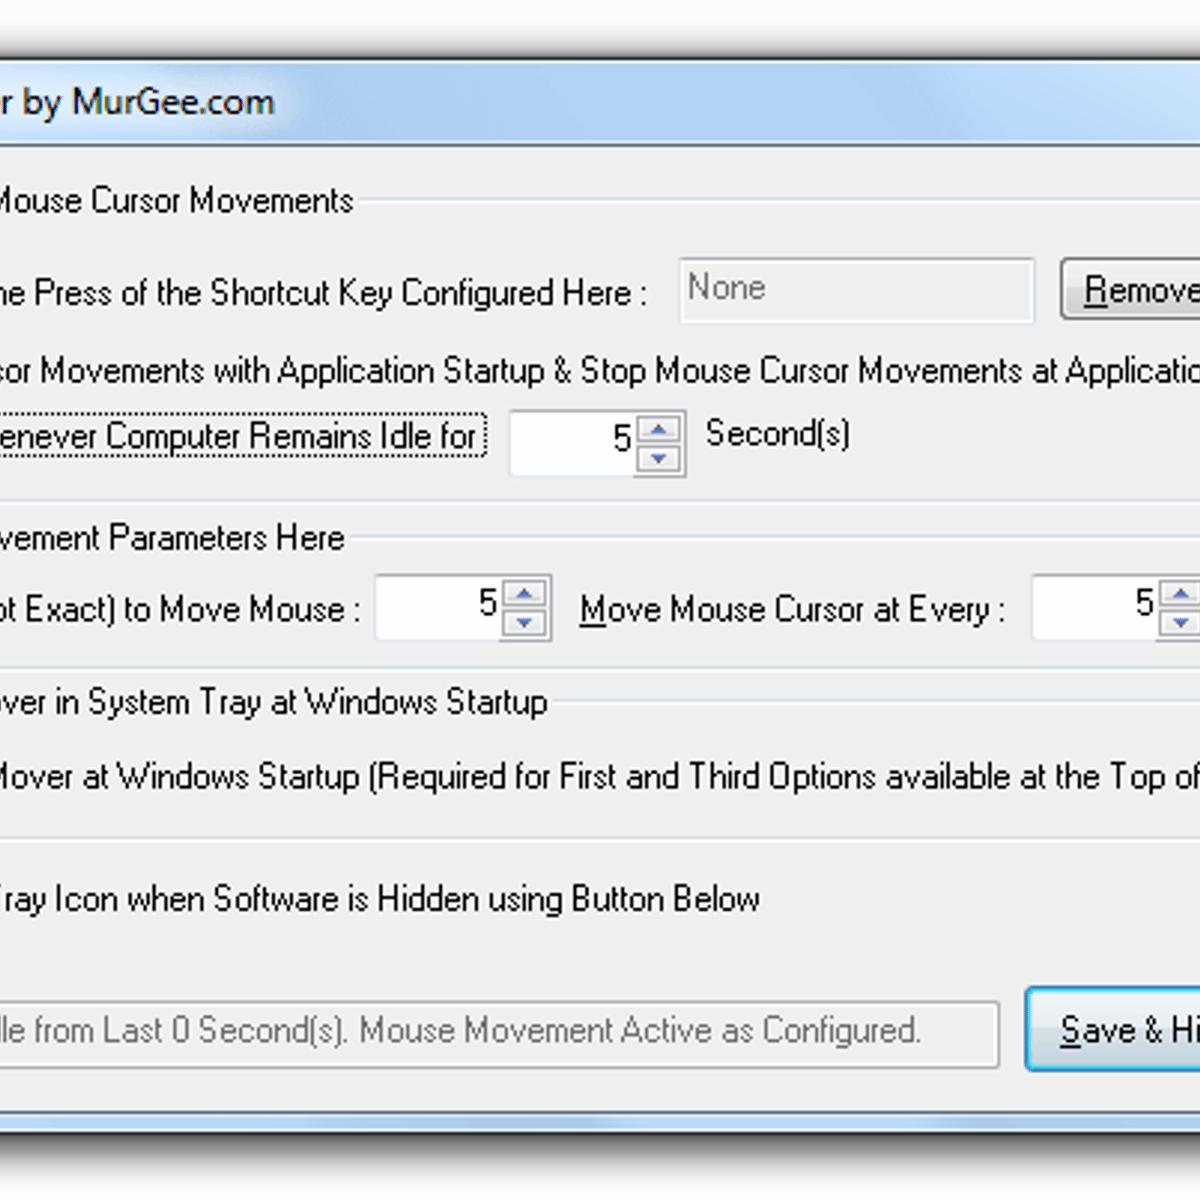 murgee auto mouse clicker registration key